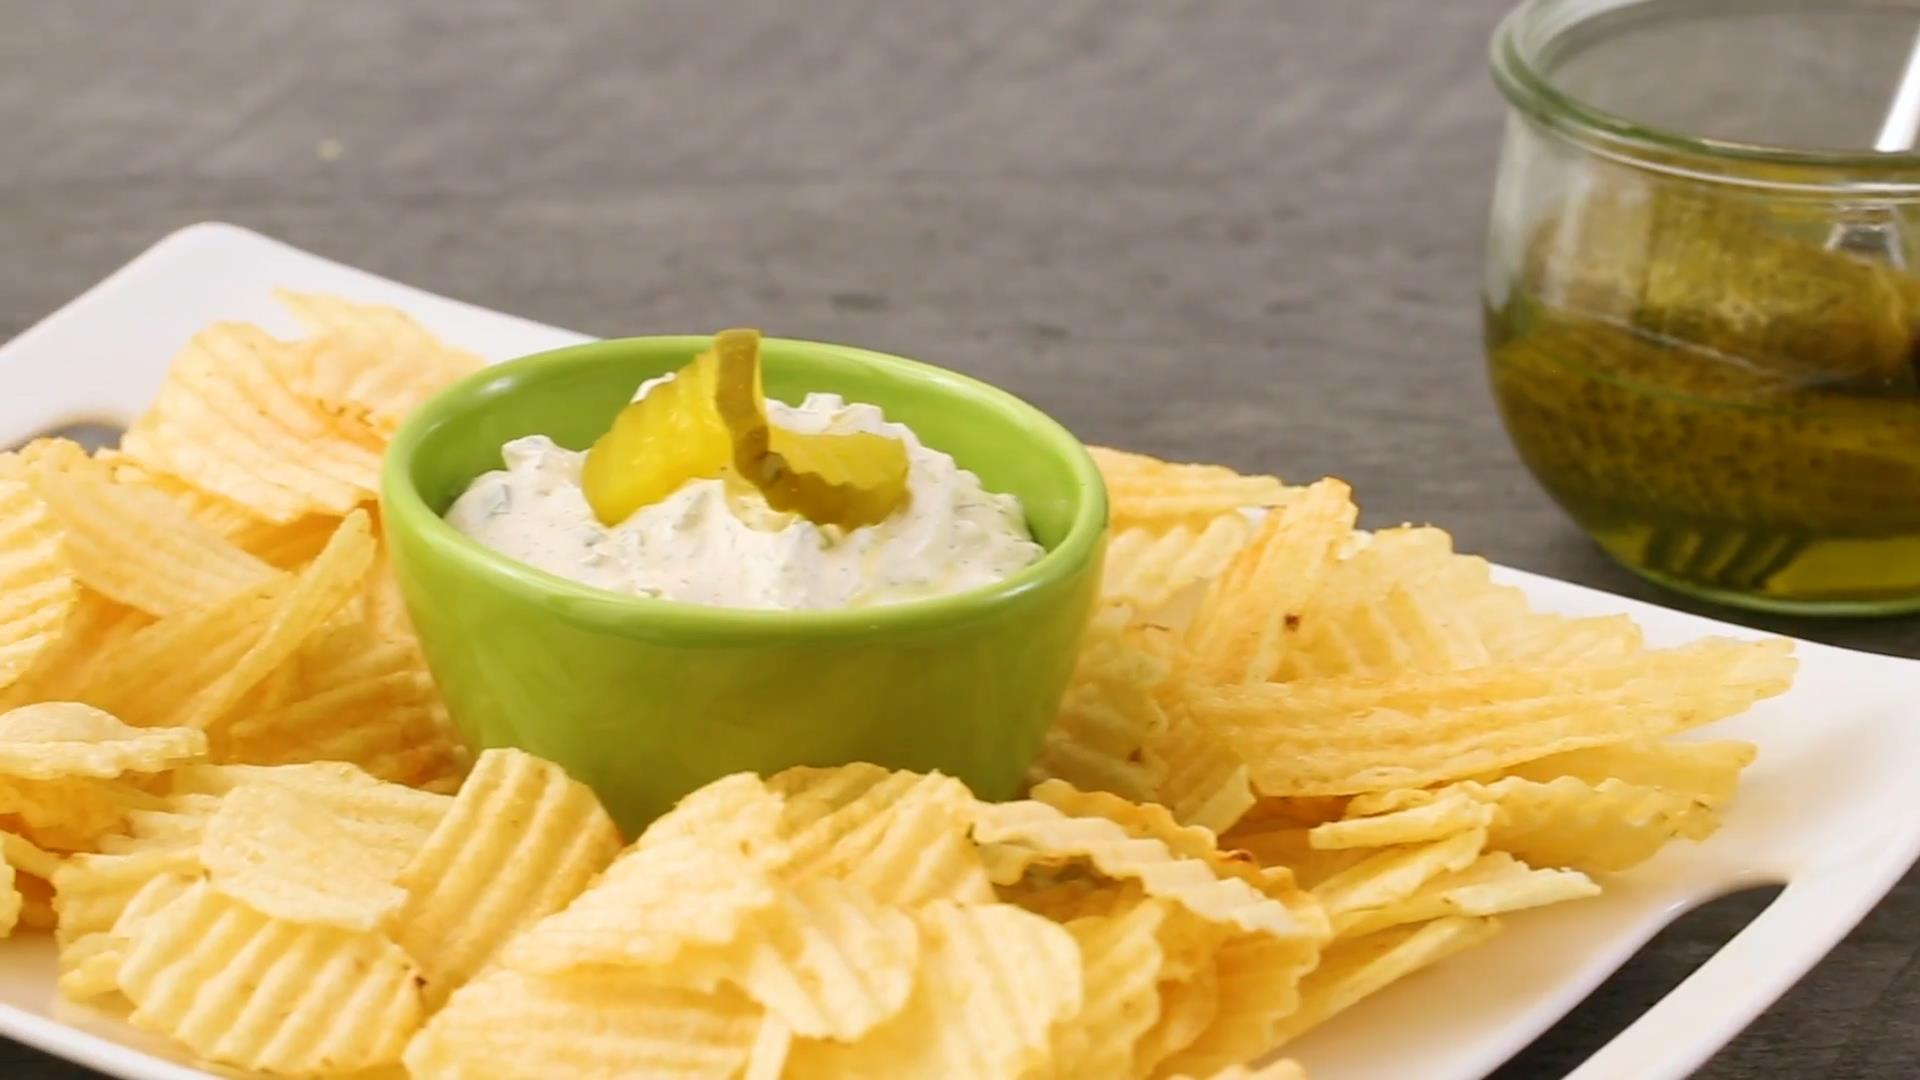 Pickle Dip image